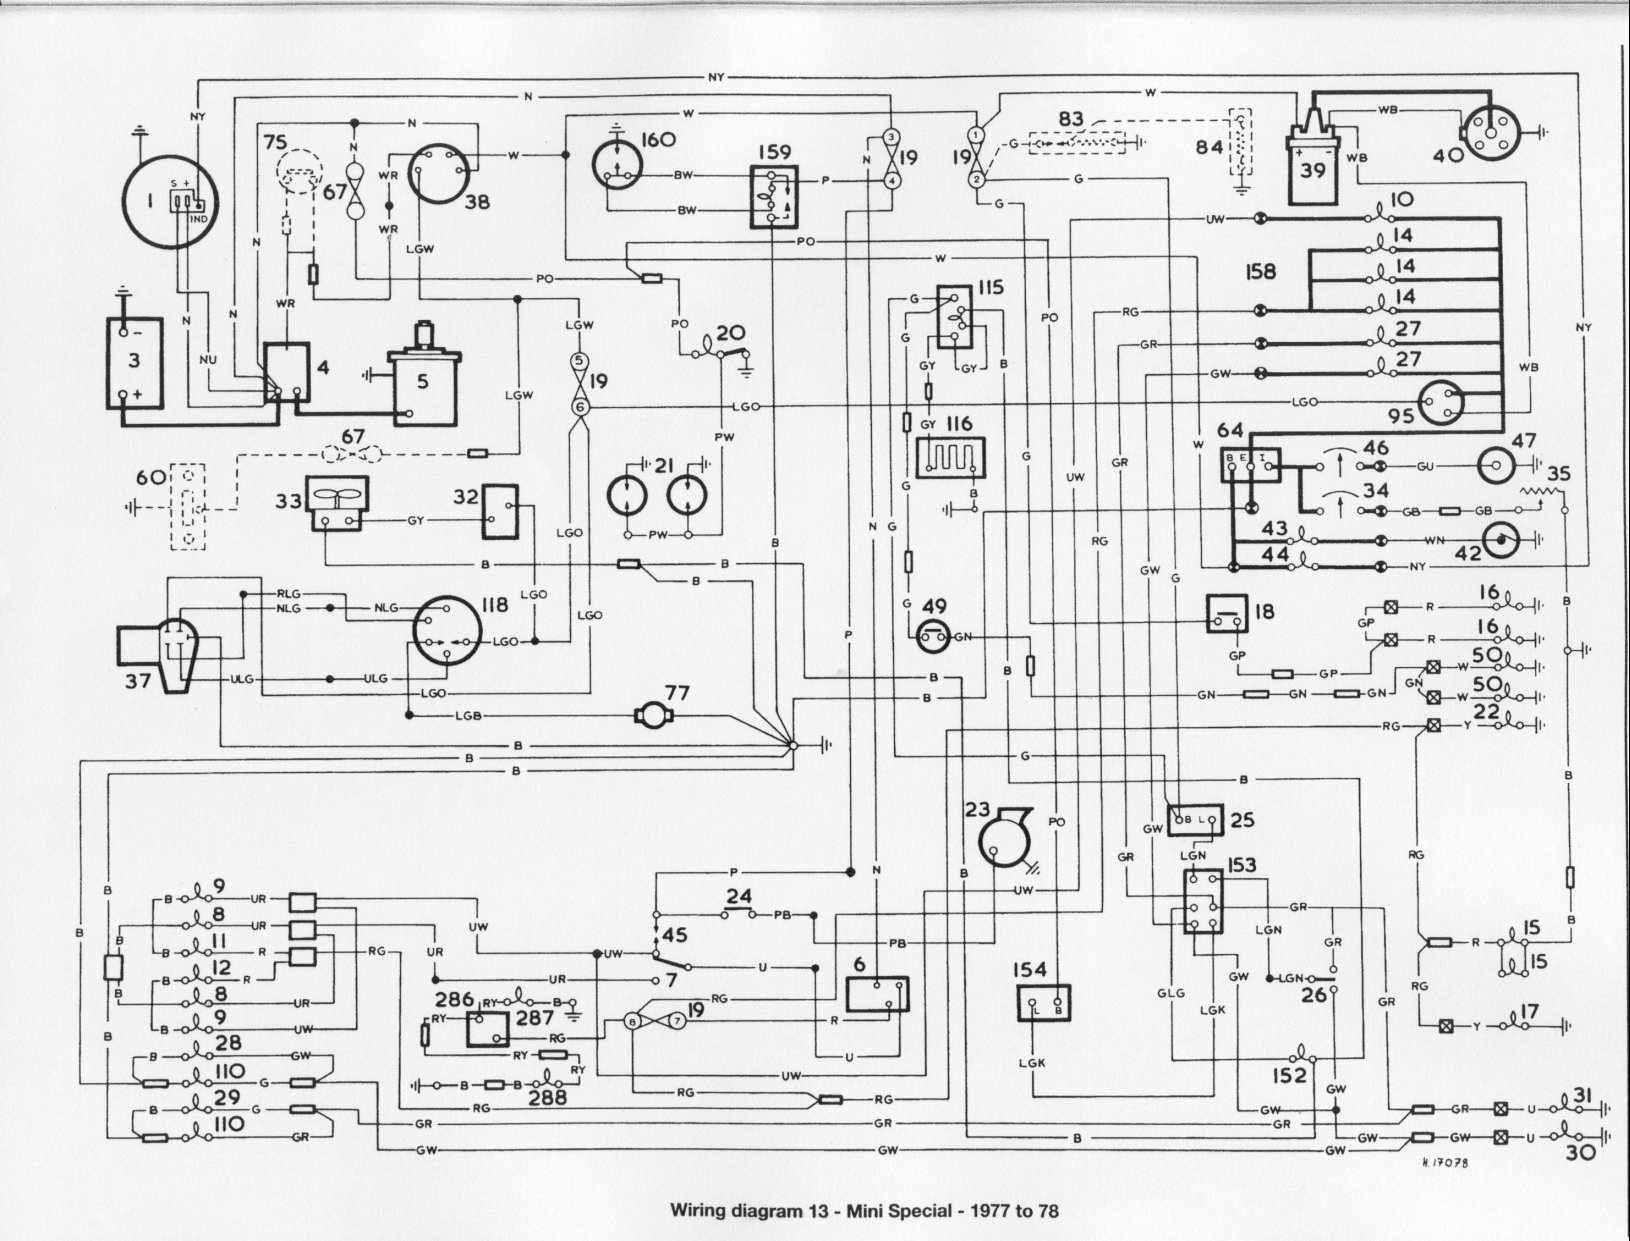 wiring diagram 2003 mini cooper wrg 3813 2003 mini cooper 2008 Saturn Astra Wiring Diagram